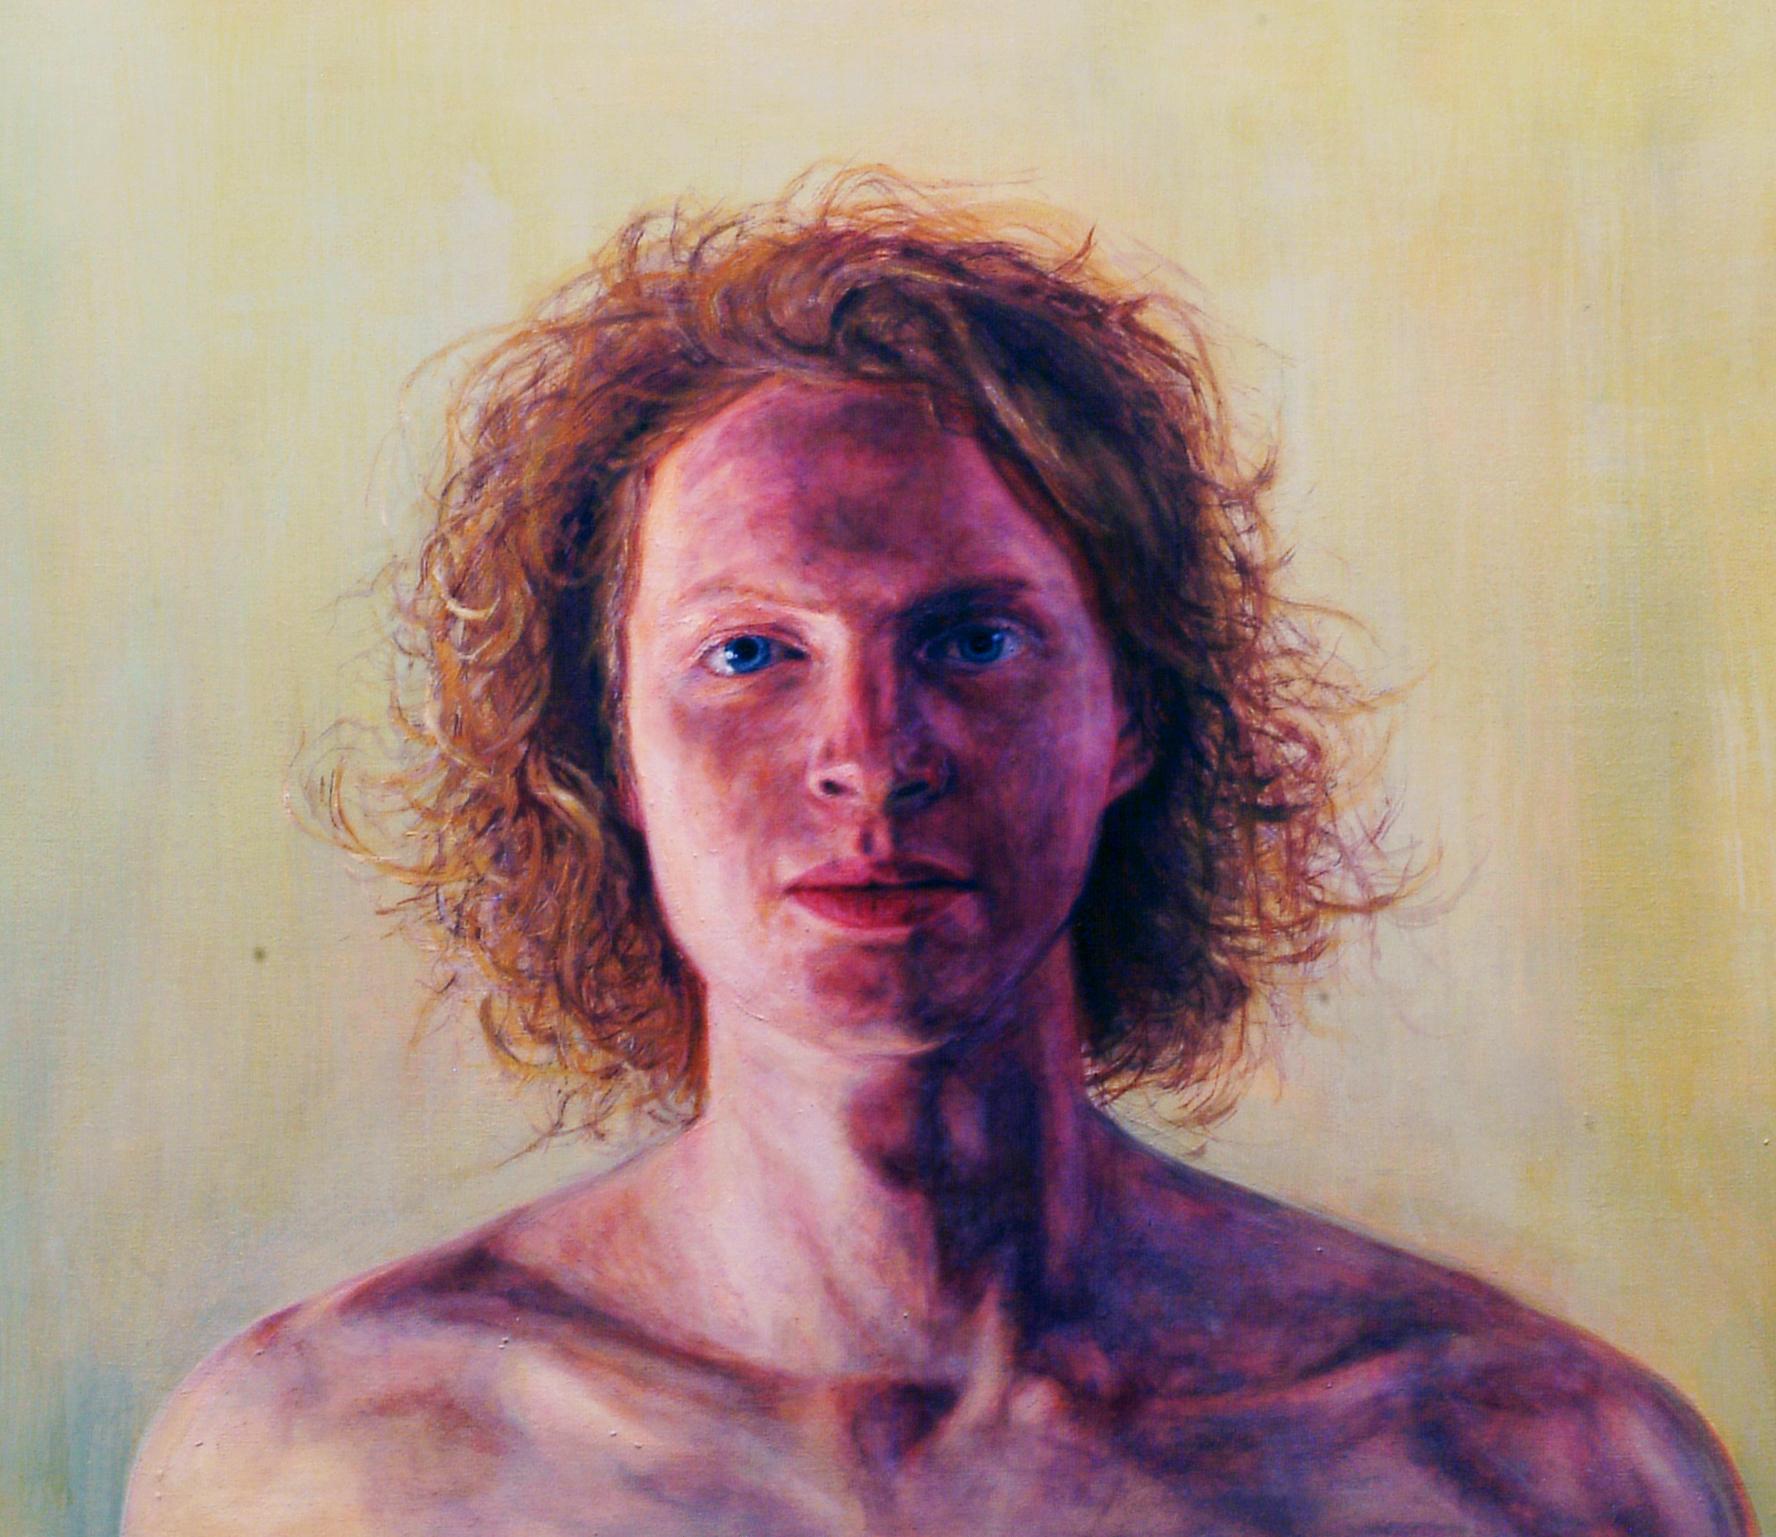 peter portrait feb 2006close up.jpg